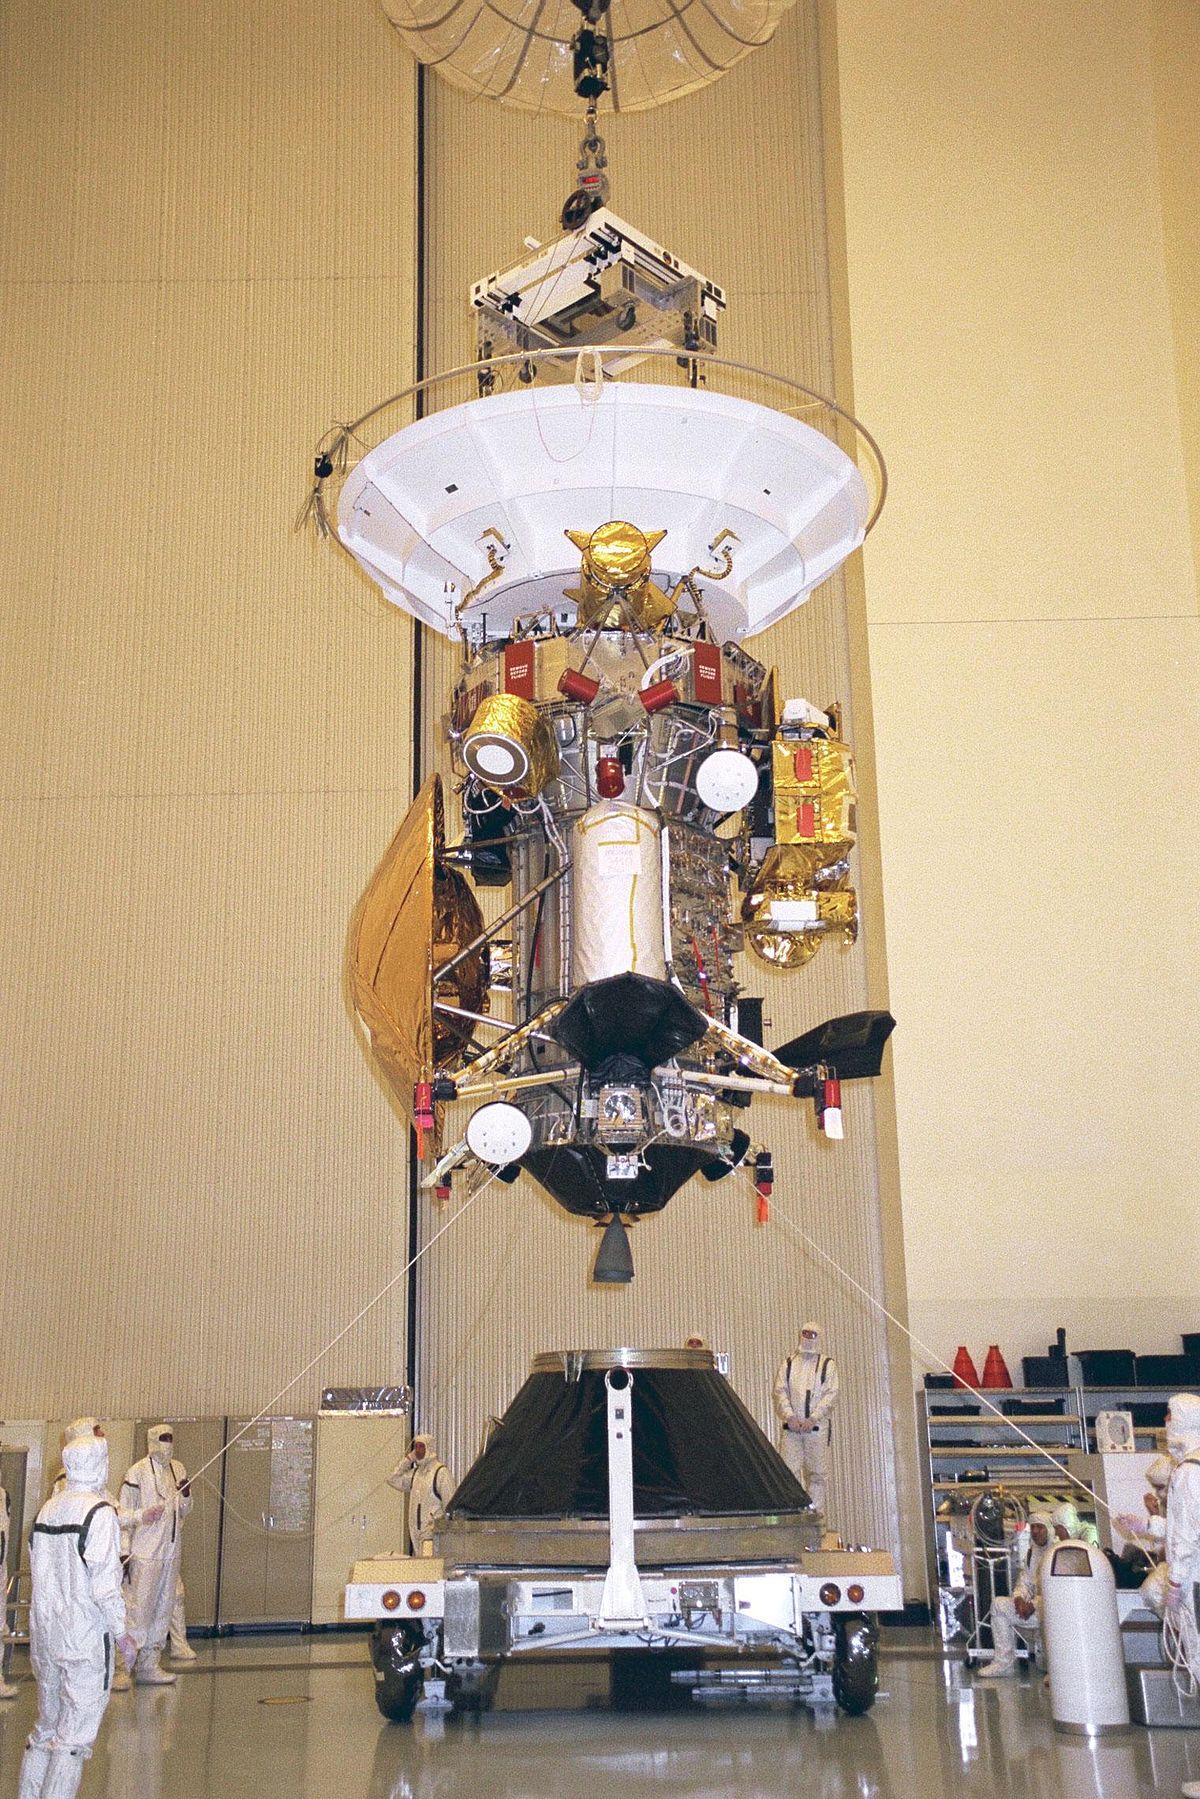 1 The Magician On Pinterest: Cassini-Huygens